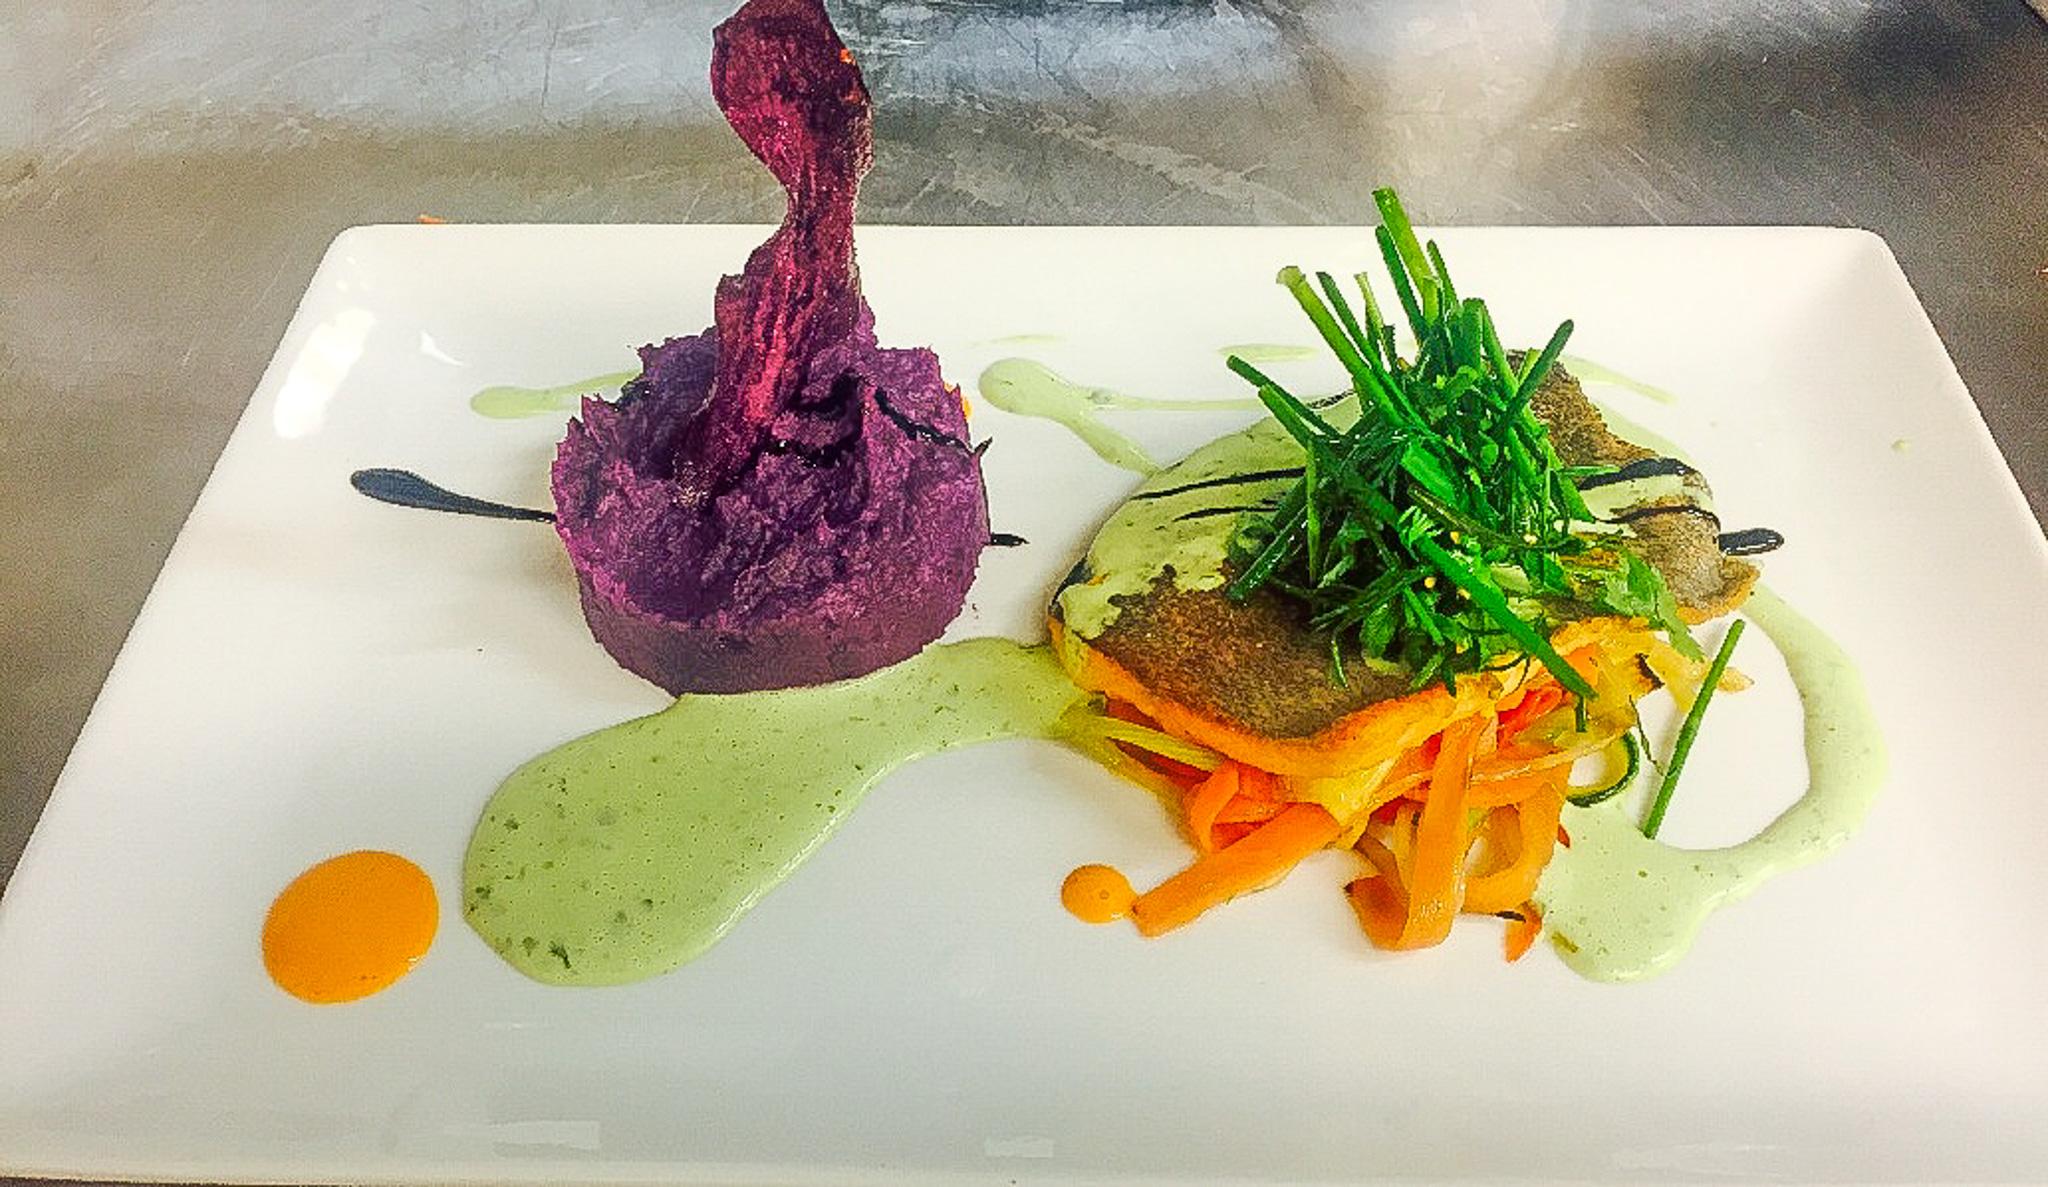 11062019-Are y sem-restaurant-argeles sur mer- 09